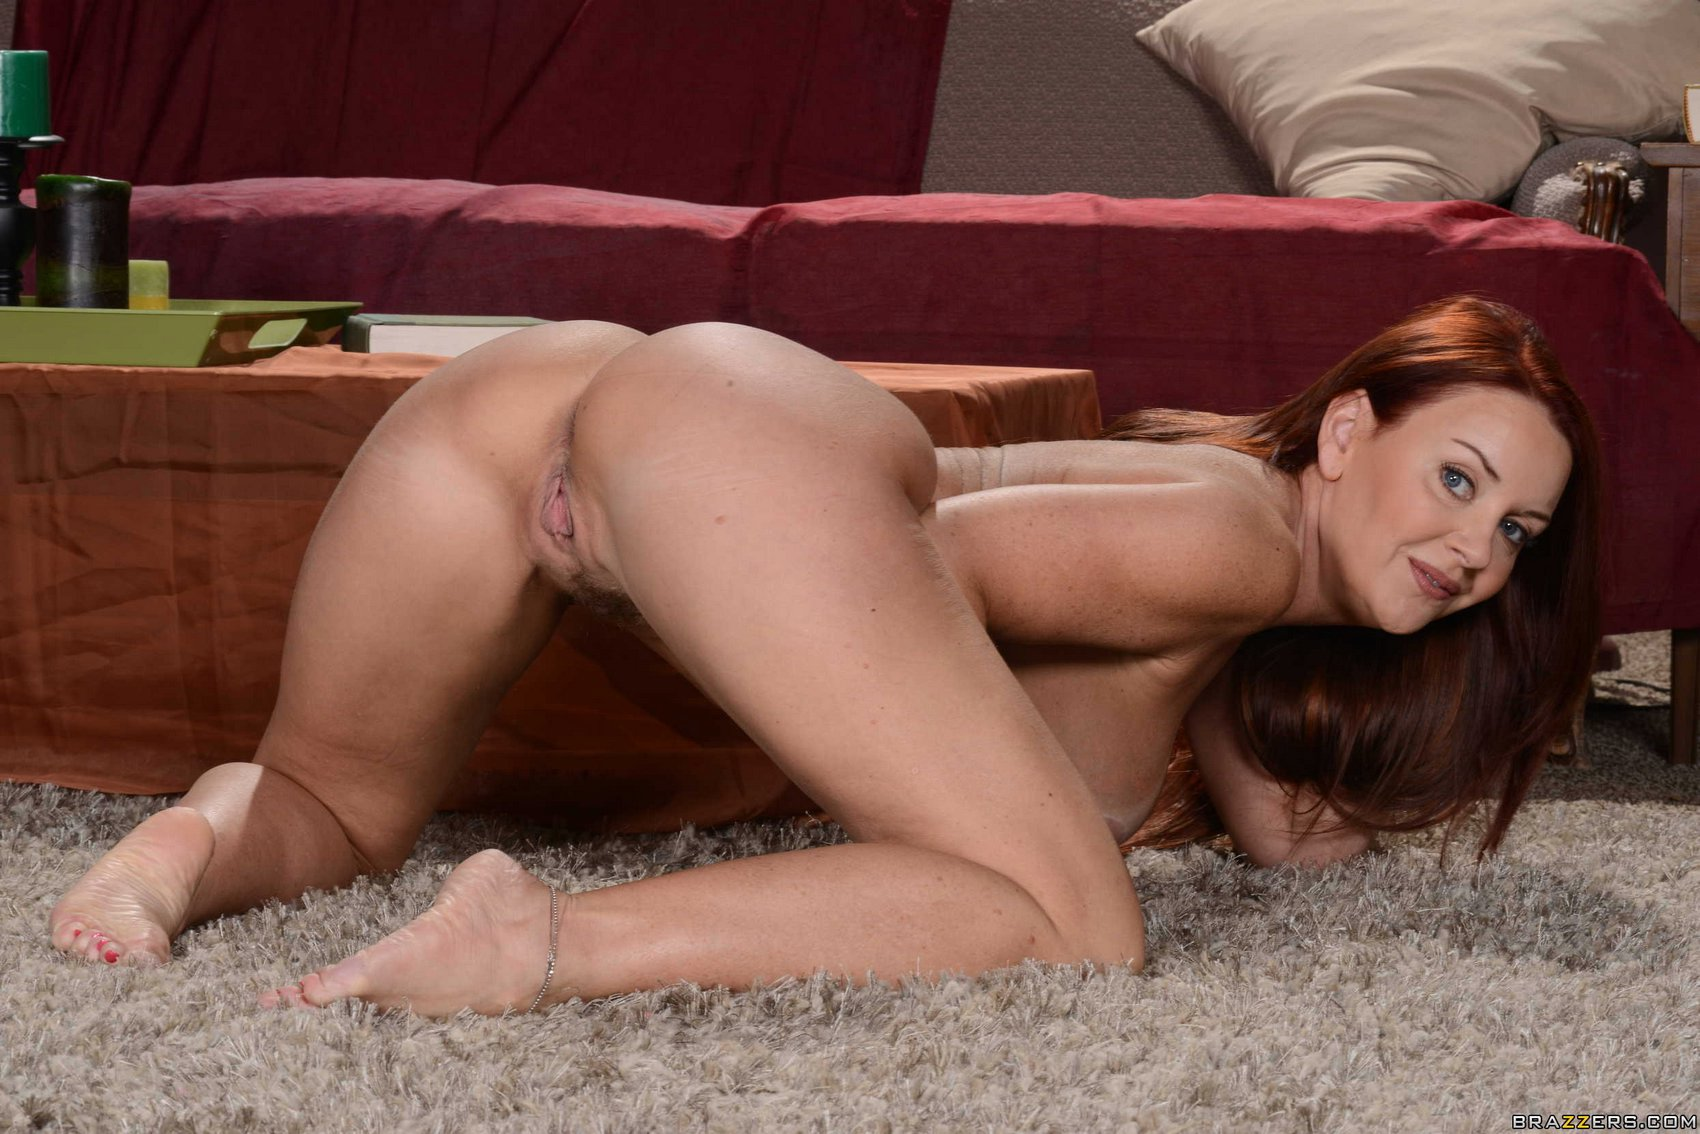 janet sharpe naked